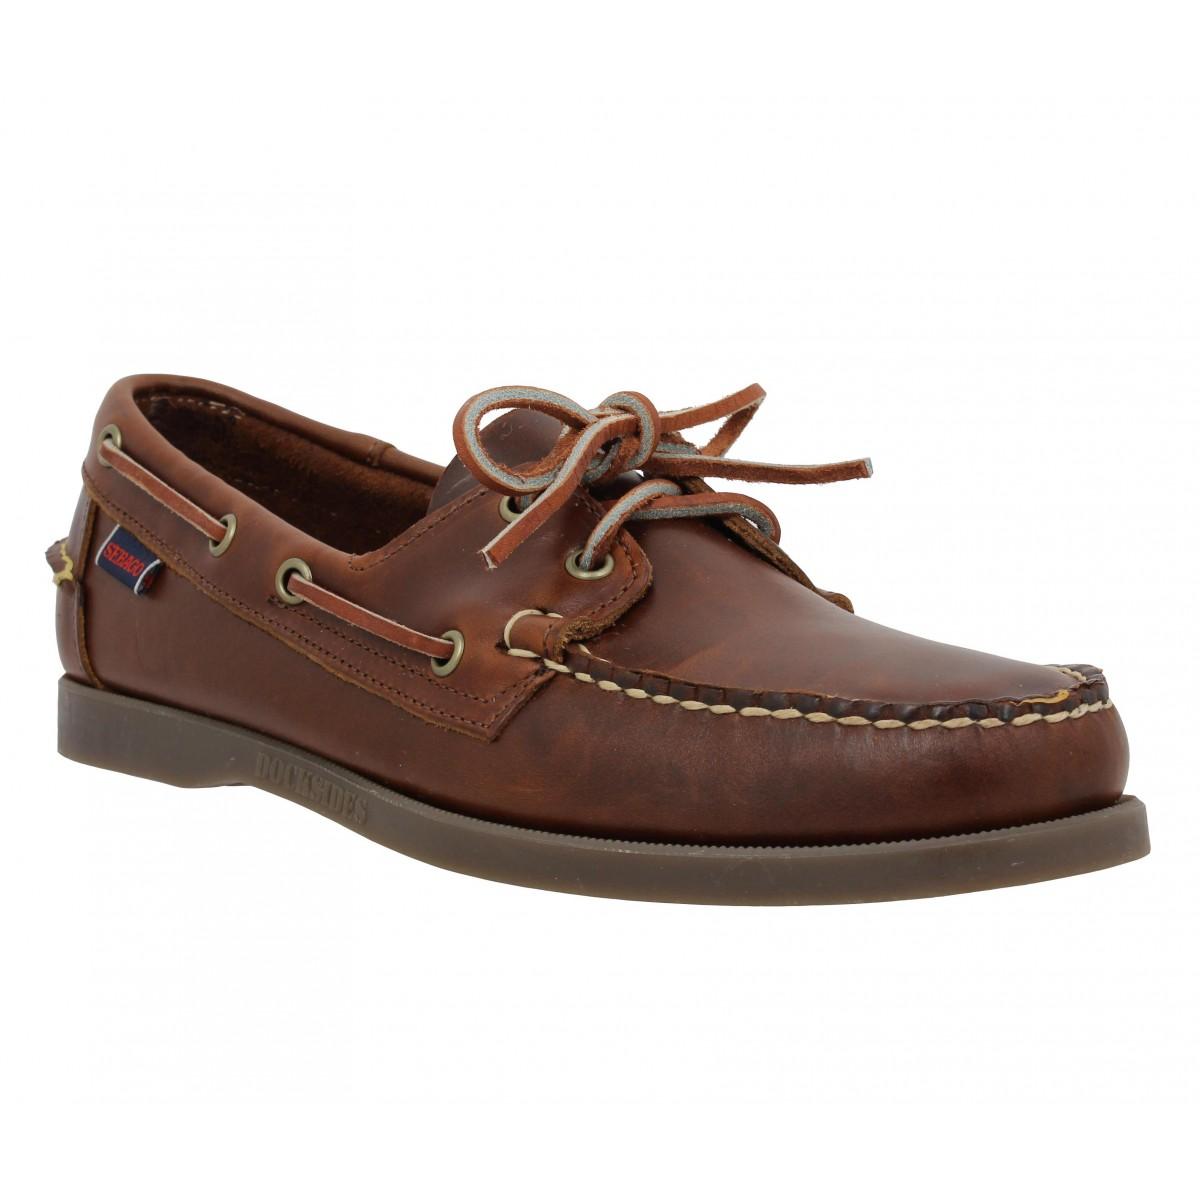 Chaussures bateaux SEBAGO Docksides cuir Homme Chocolat